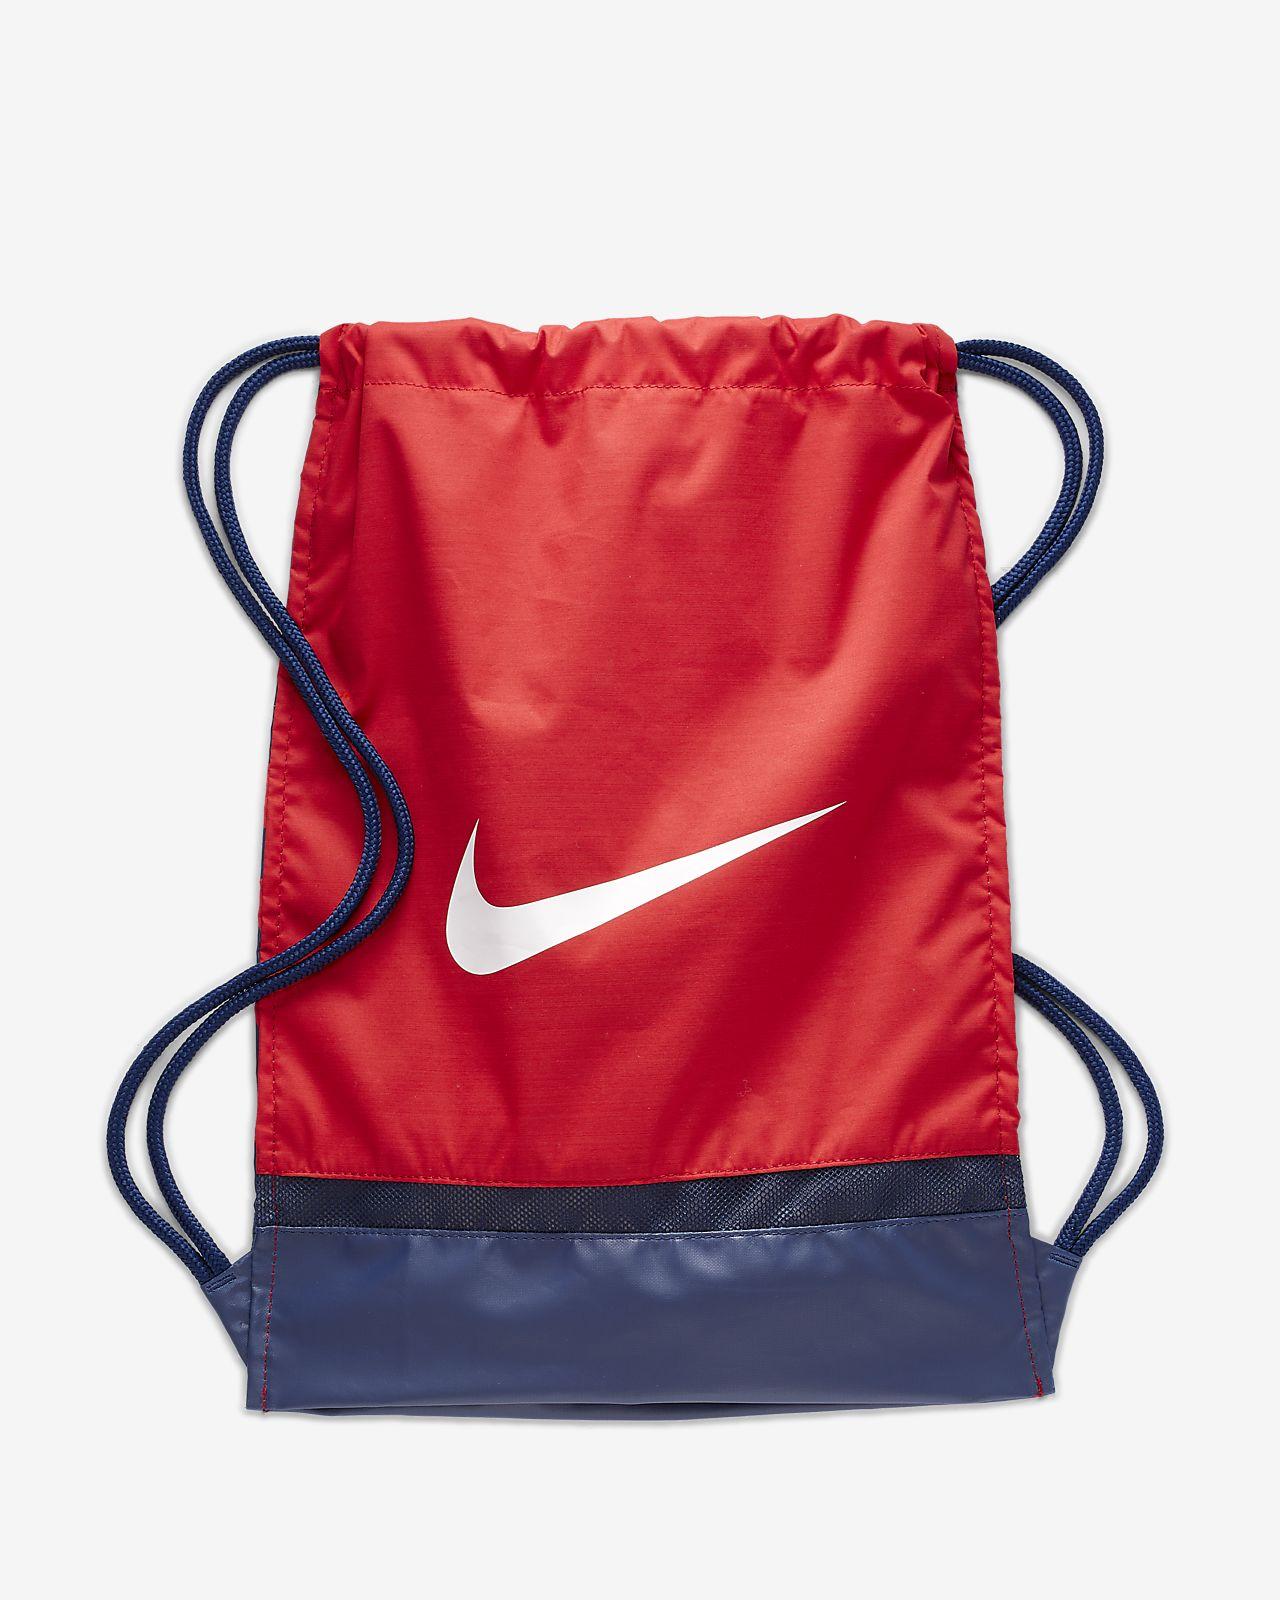 4a661112b4 Nike Brasilia Training Gym Sack. Nike.com